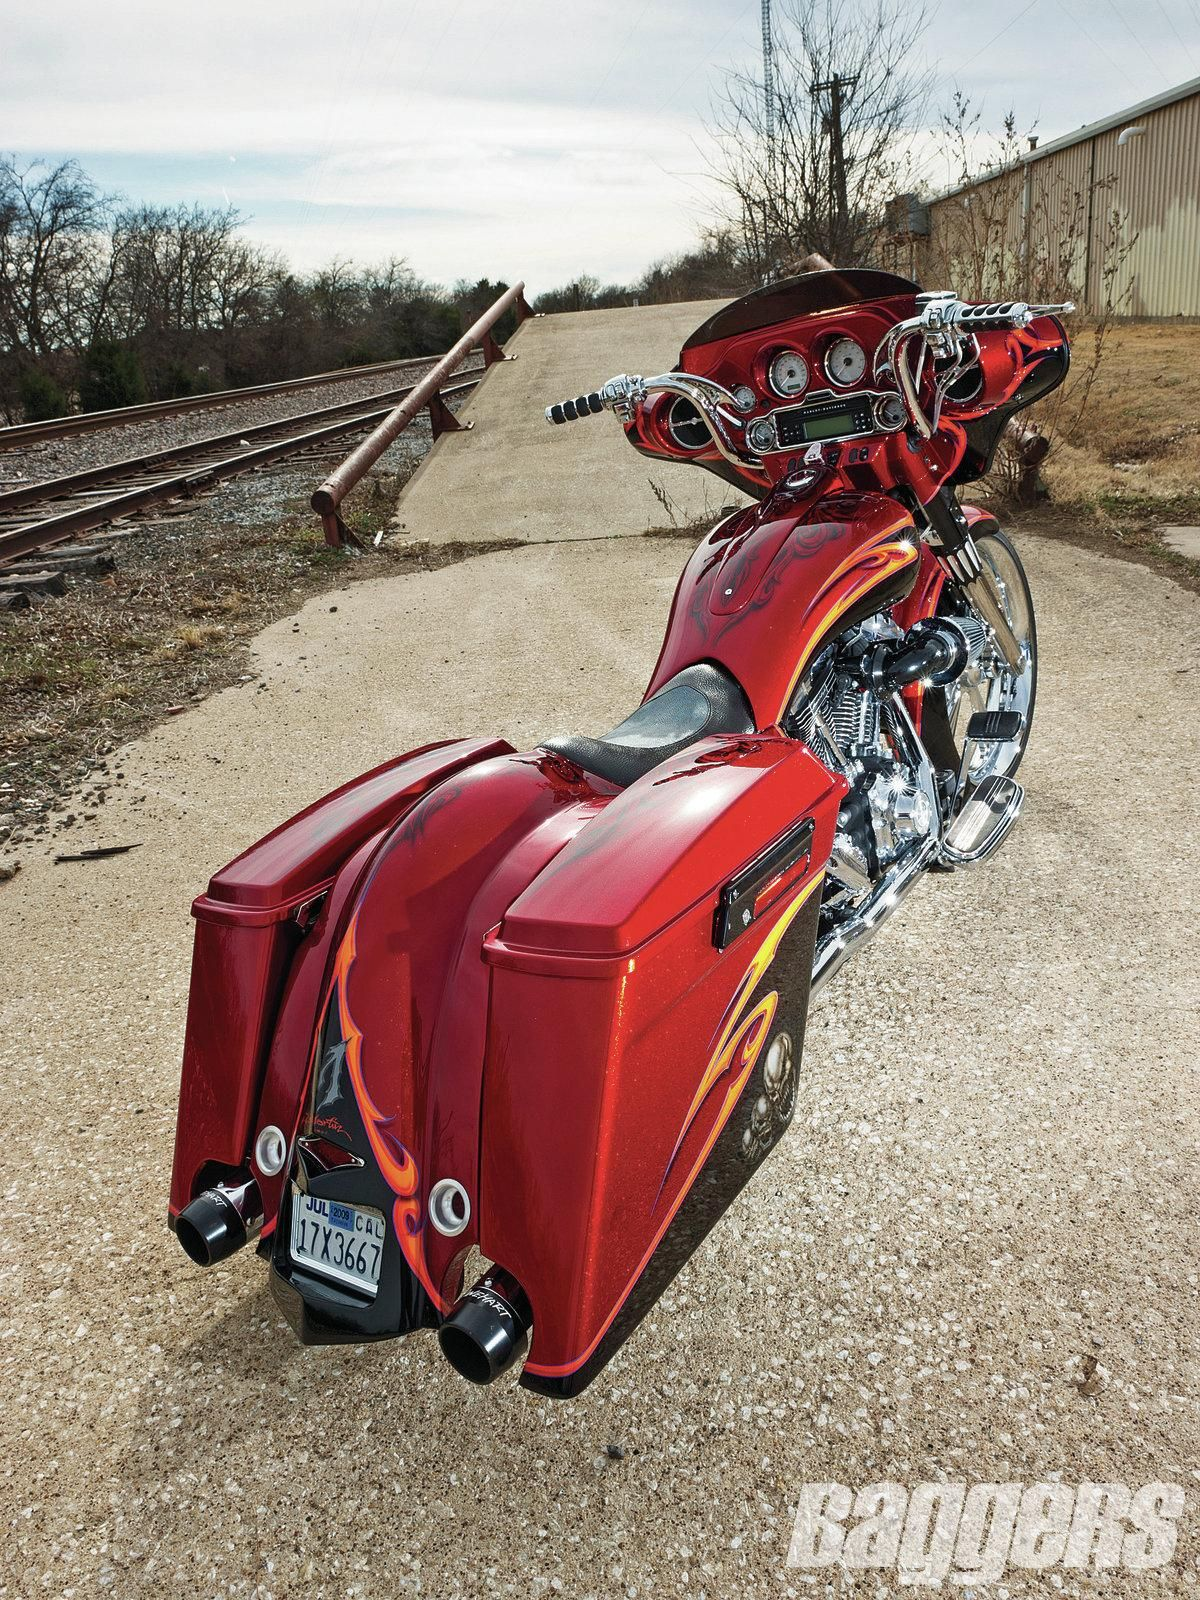 Big In Texas | 2007 Harley-Davidson Street Glide | Baggers